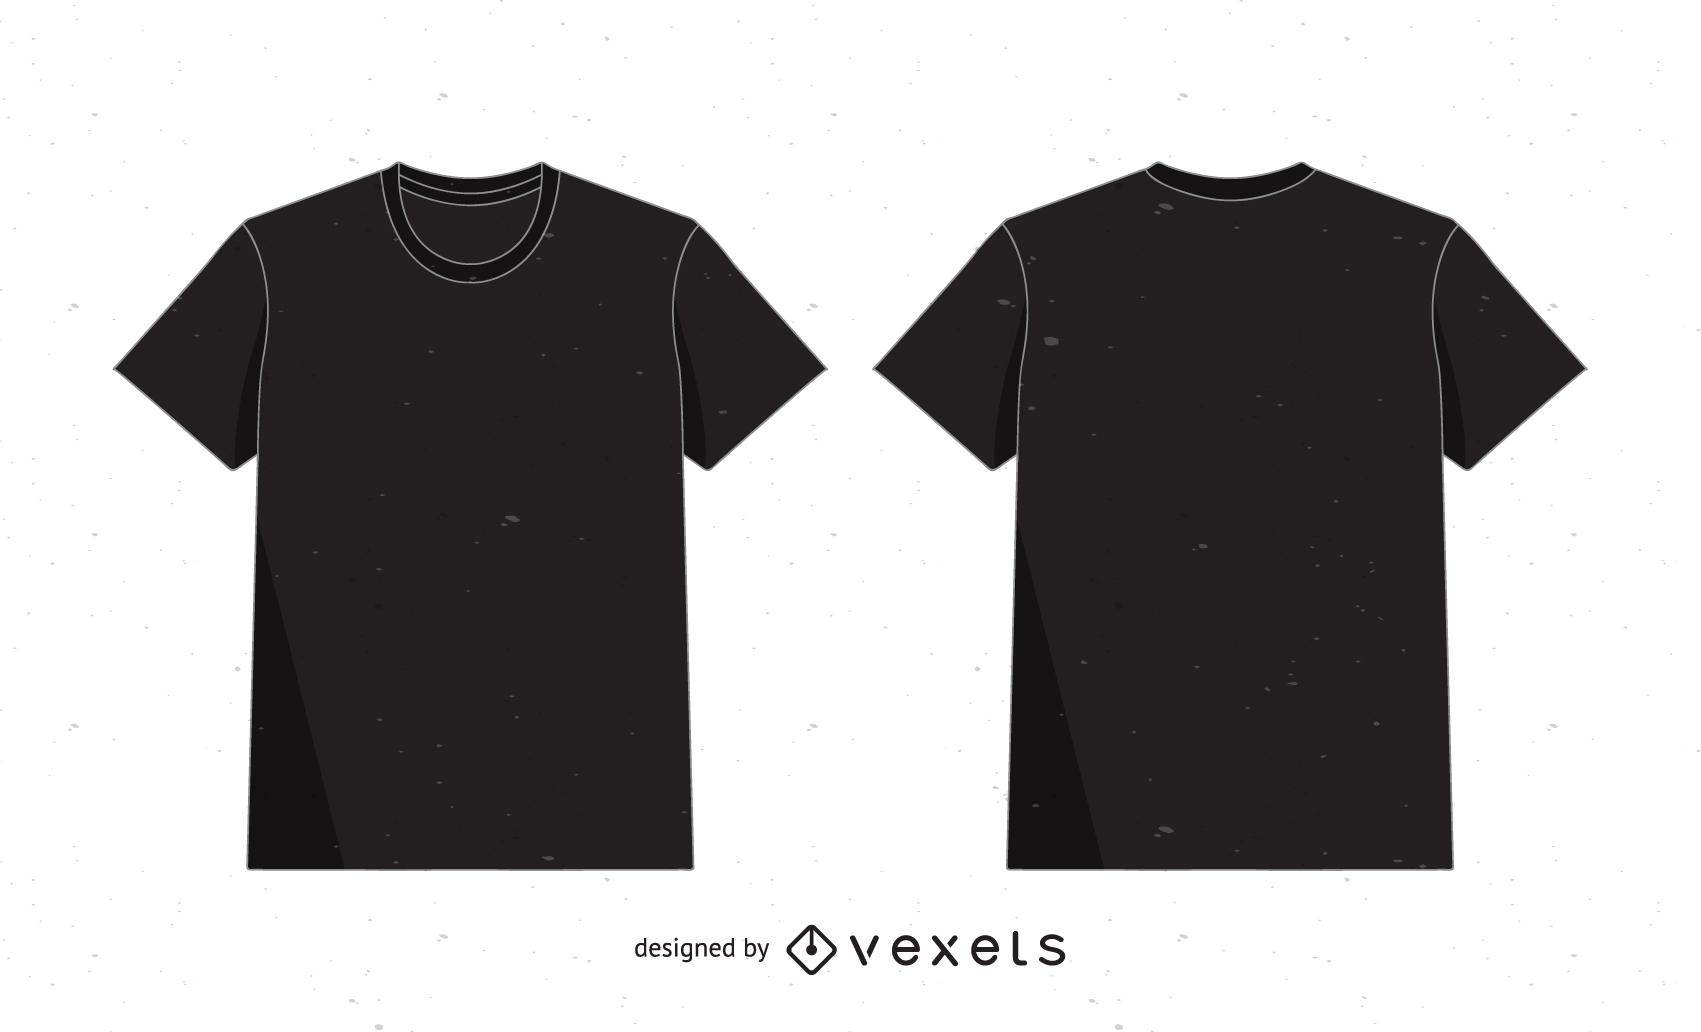 T shirt vector in black over white